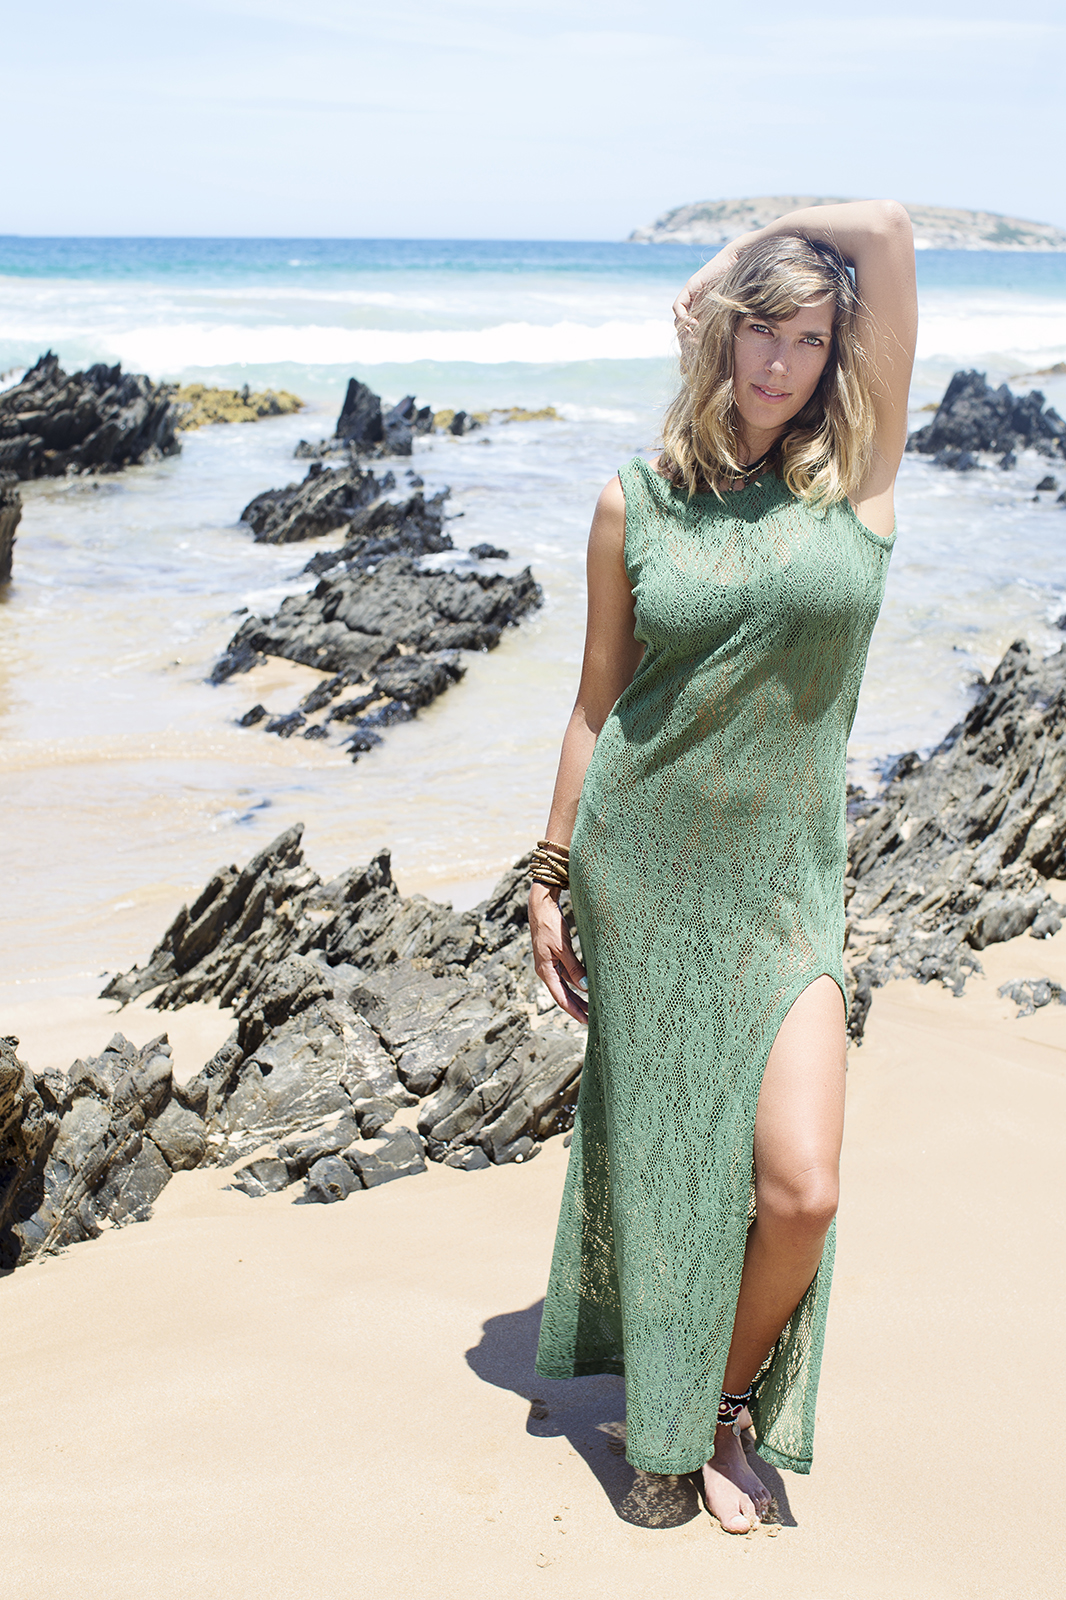 Natural Arty Adelaide Beach Fashion Portrait Full Body.jpg